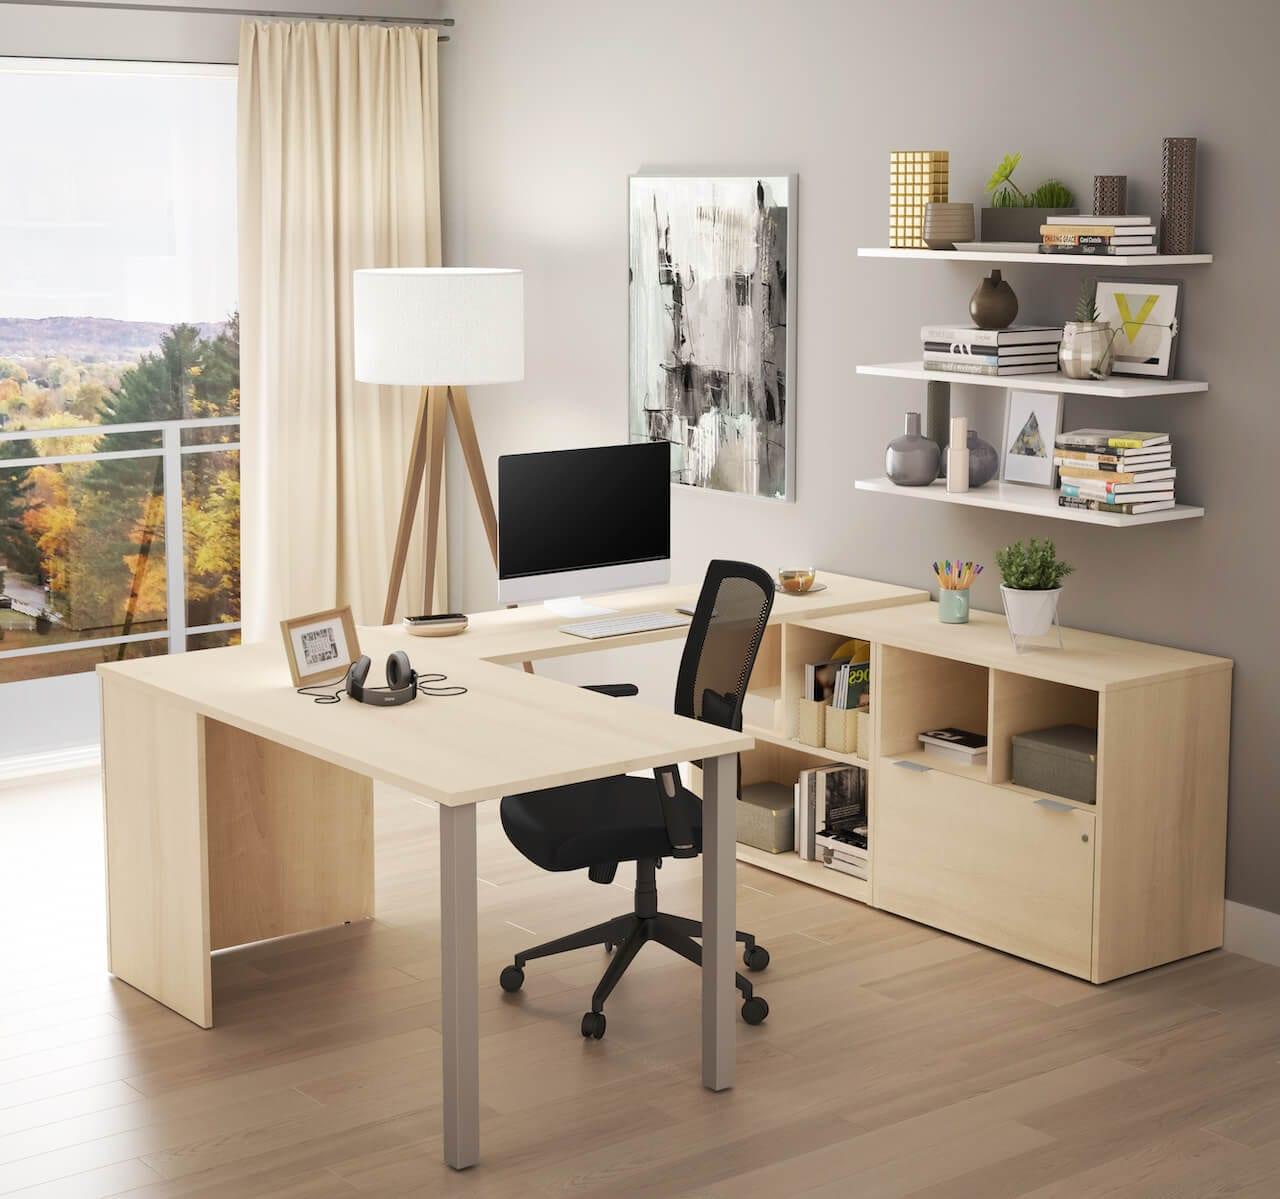 offiz-hoomz-inrichtingsadvies zeist-thuiswerkplek-home-office